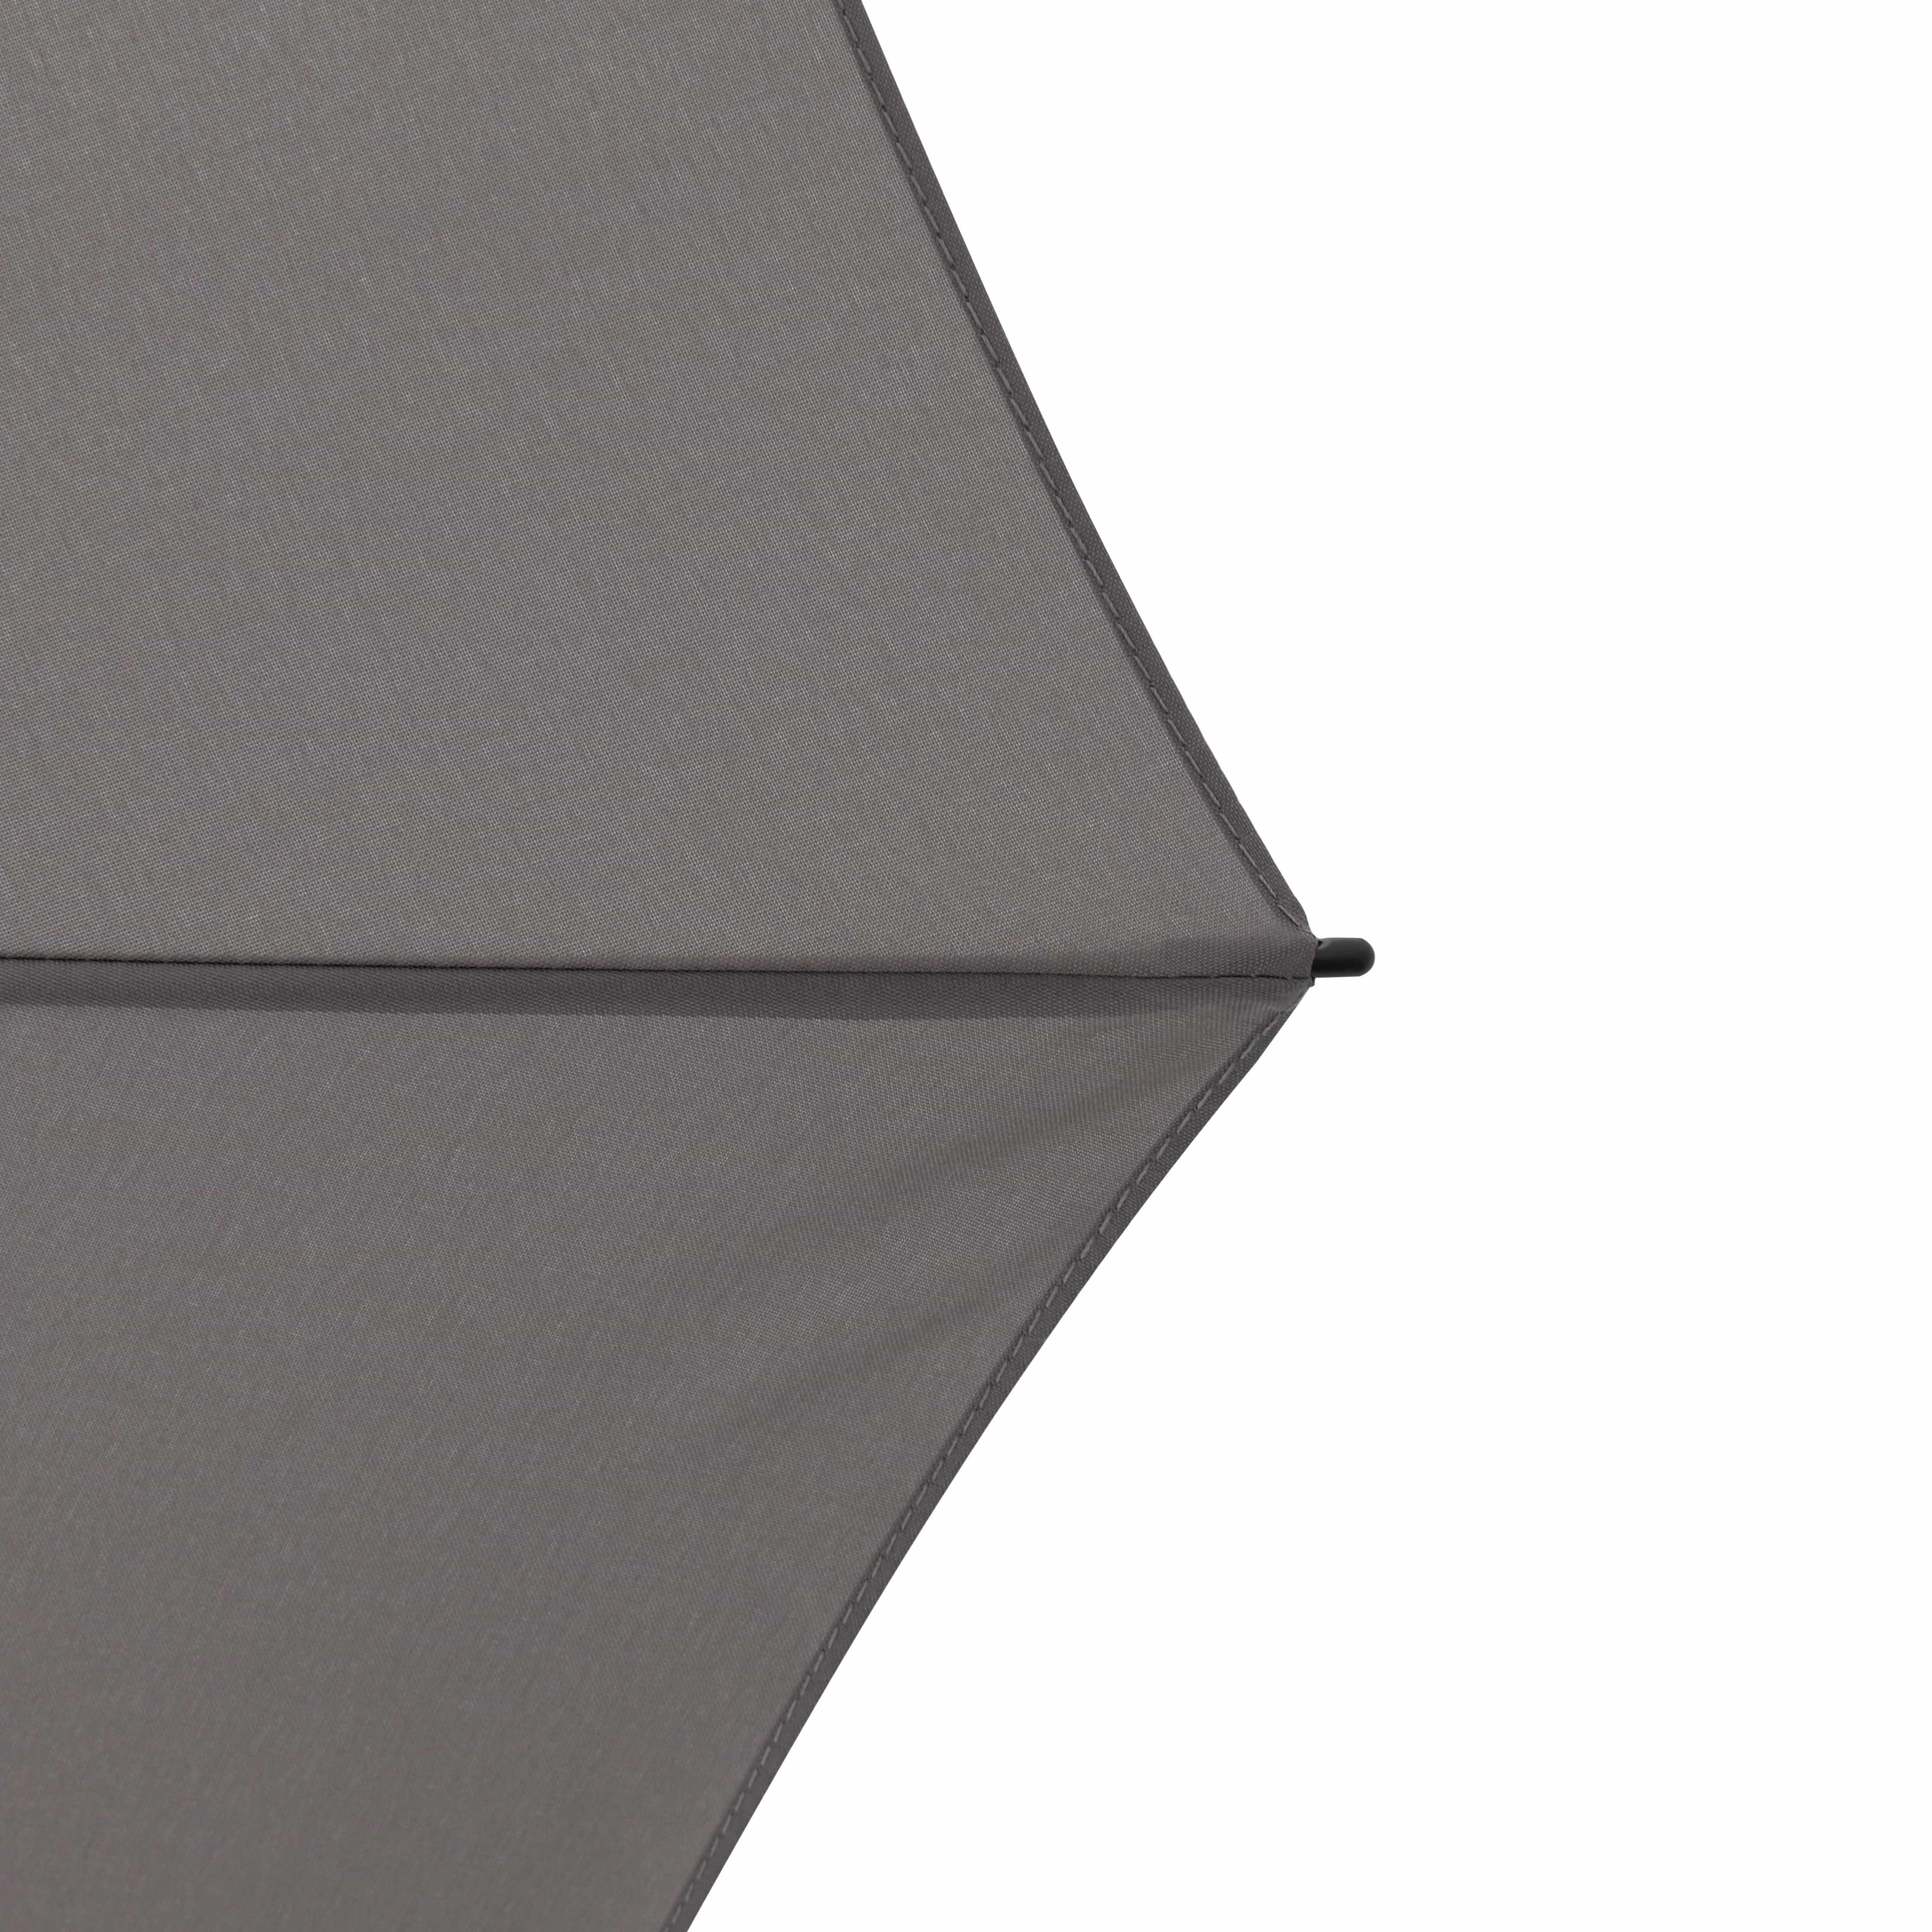 Knirps Umbrella C.050 medium manual - foto 6